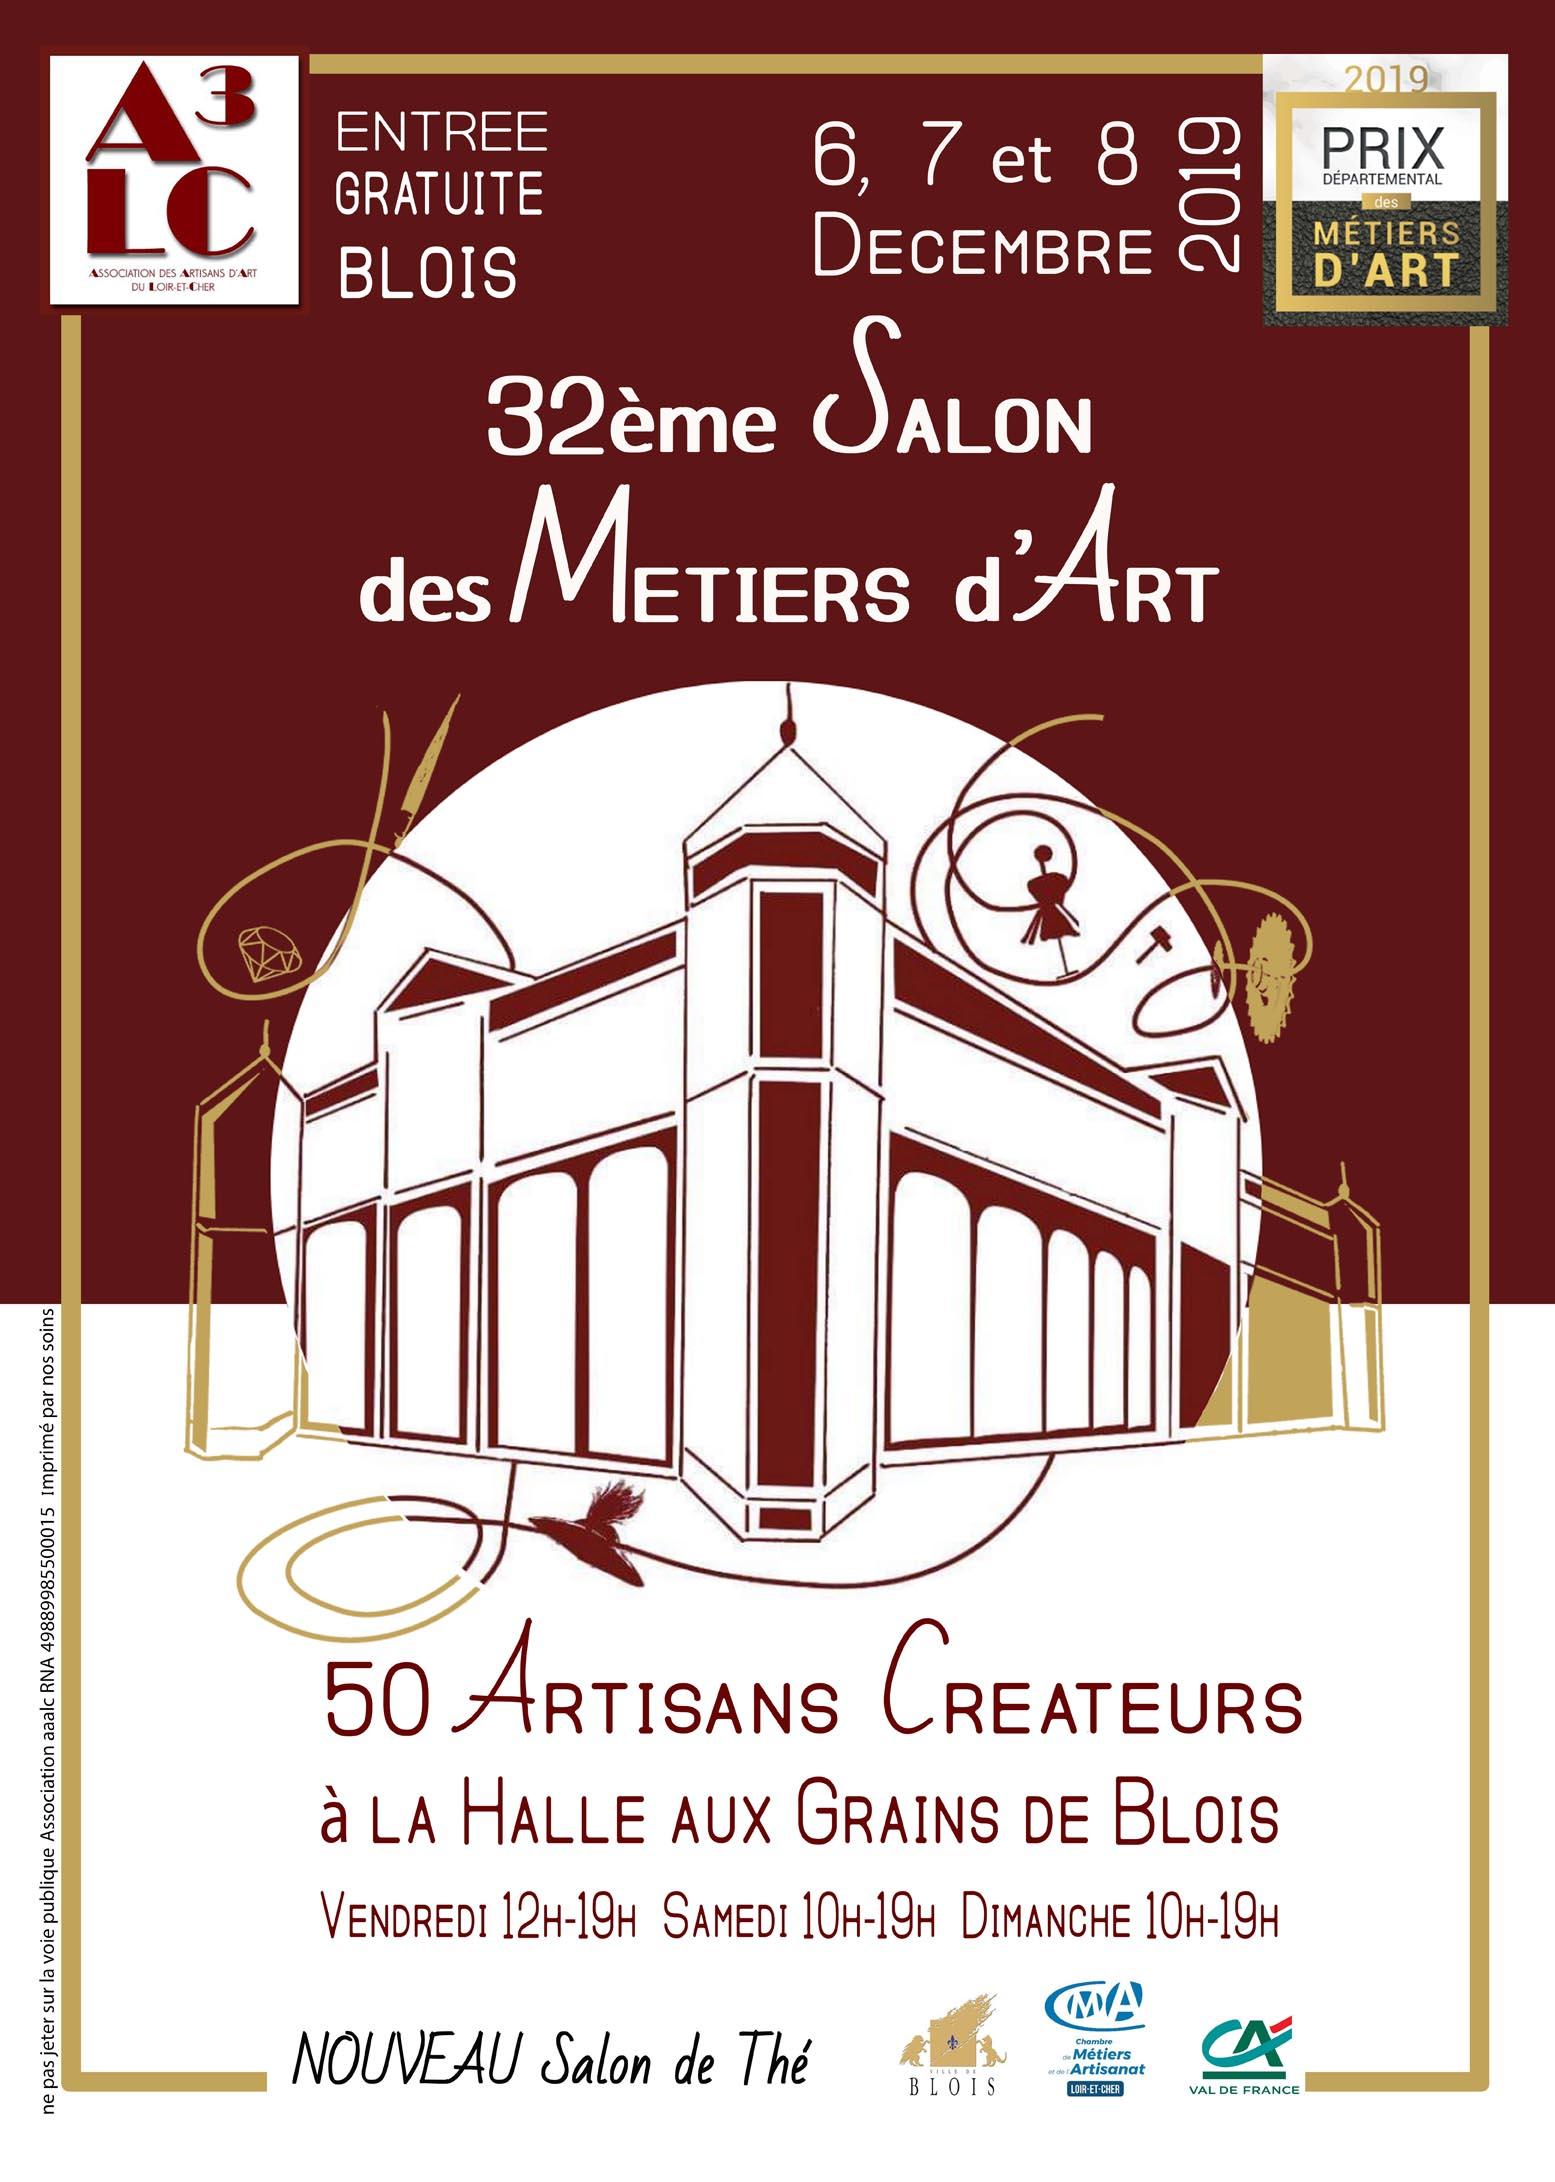 affiche_salon-metier-dart_AAALC2019